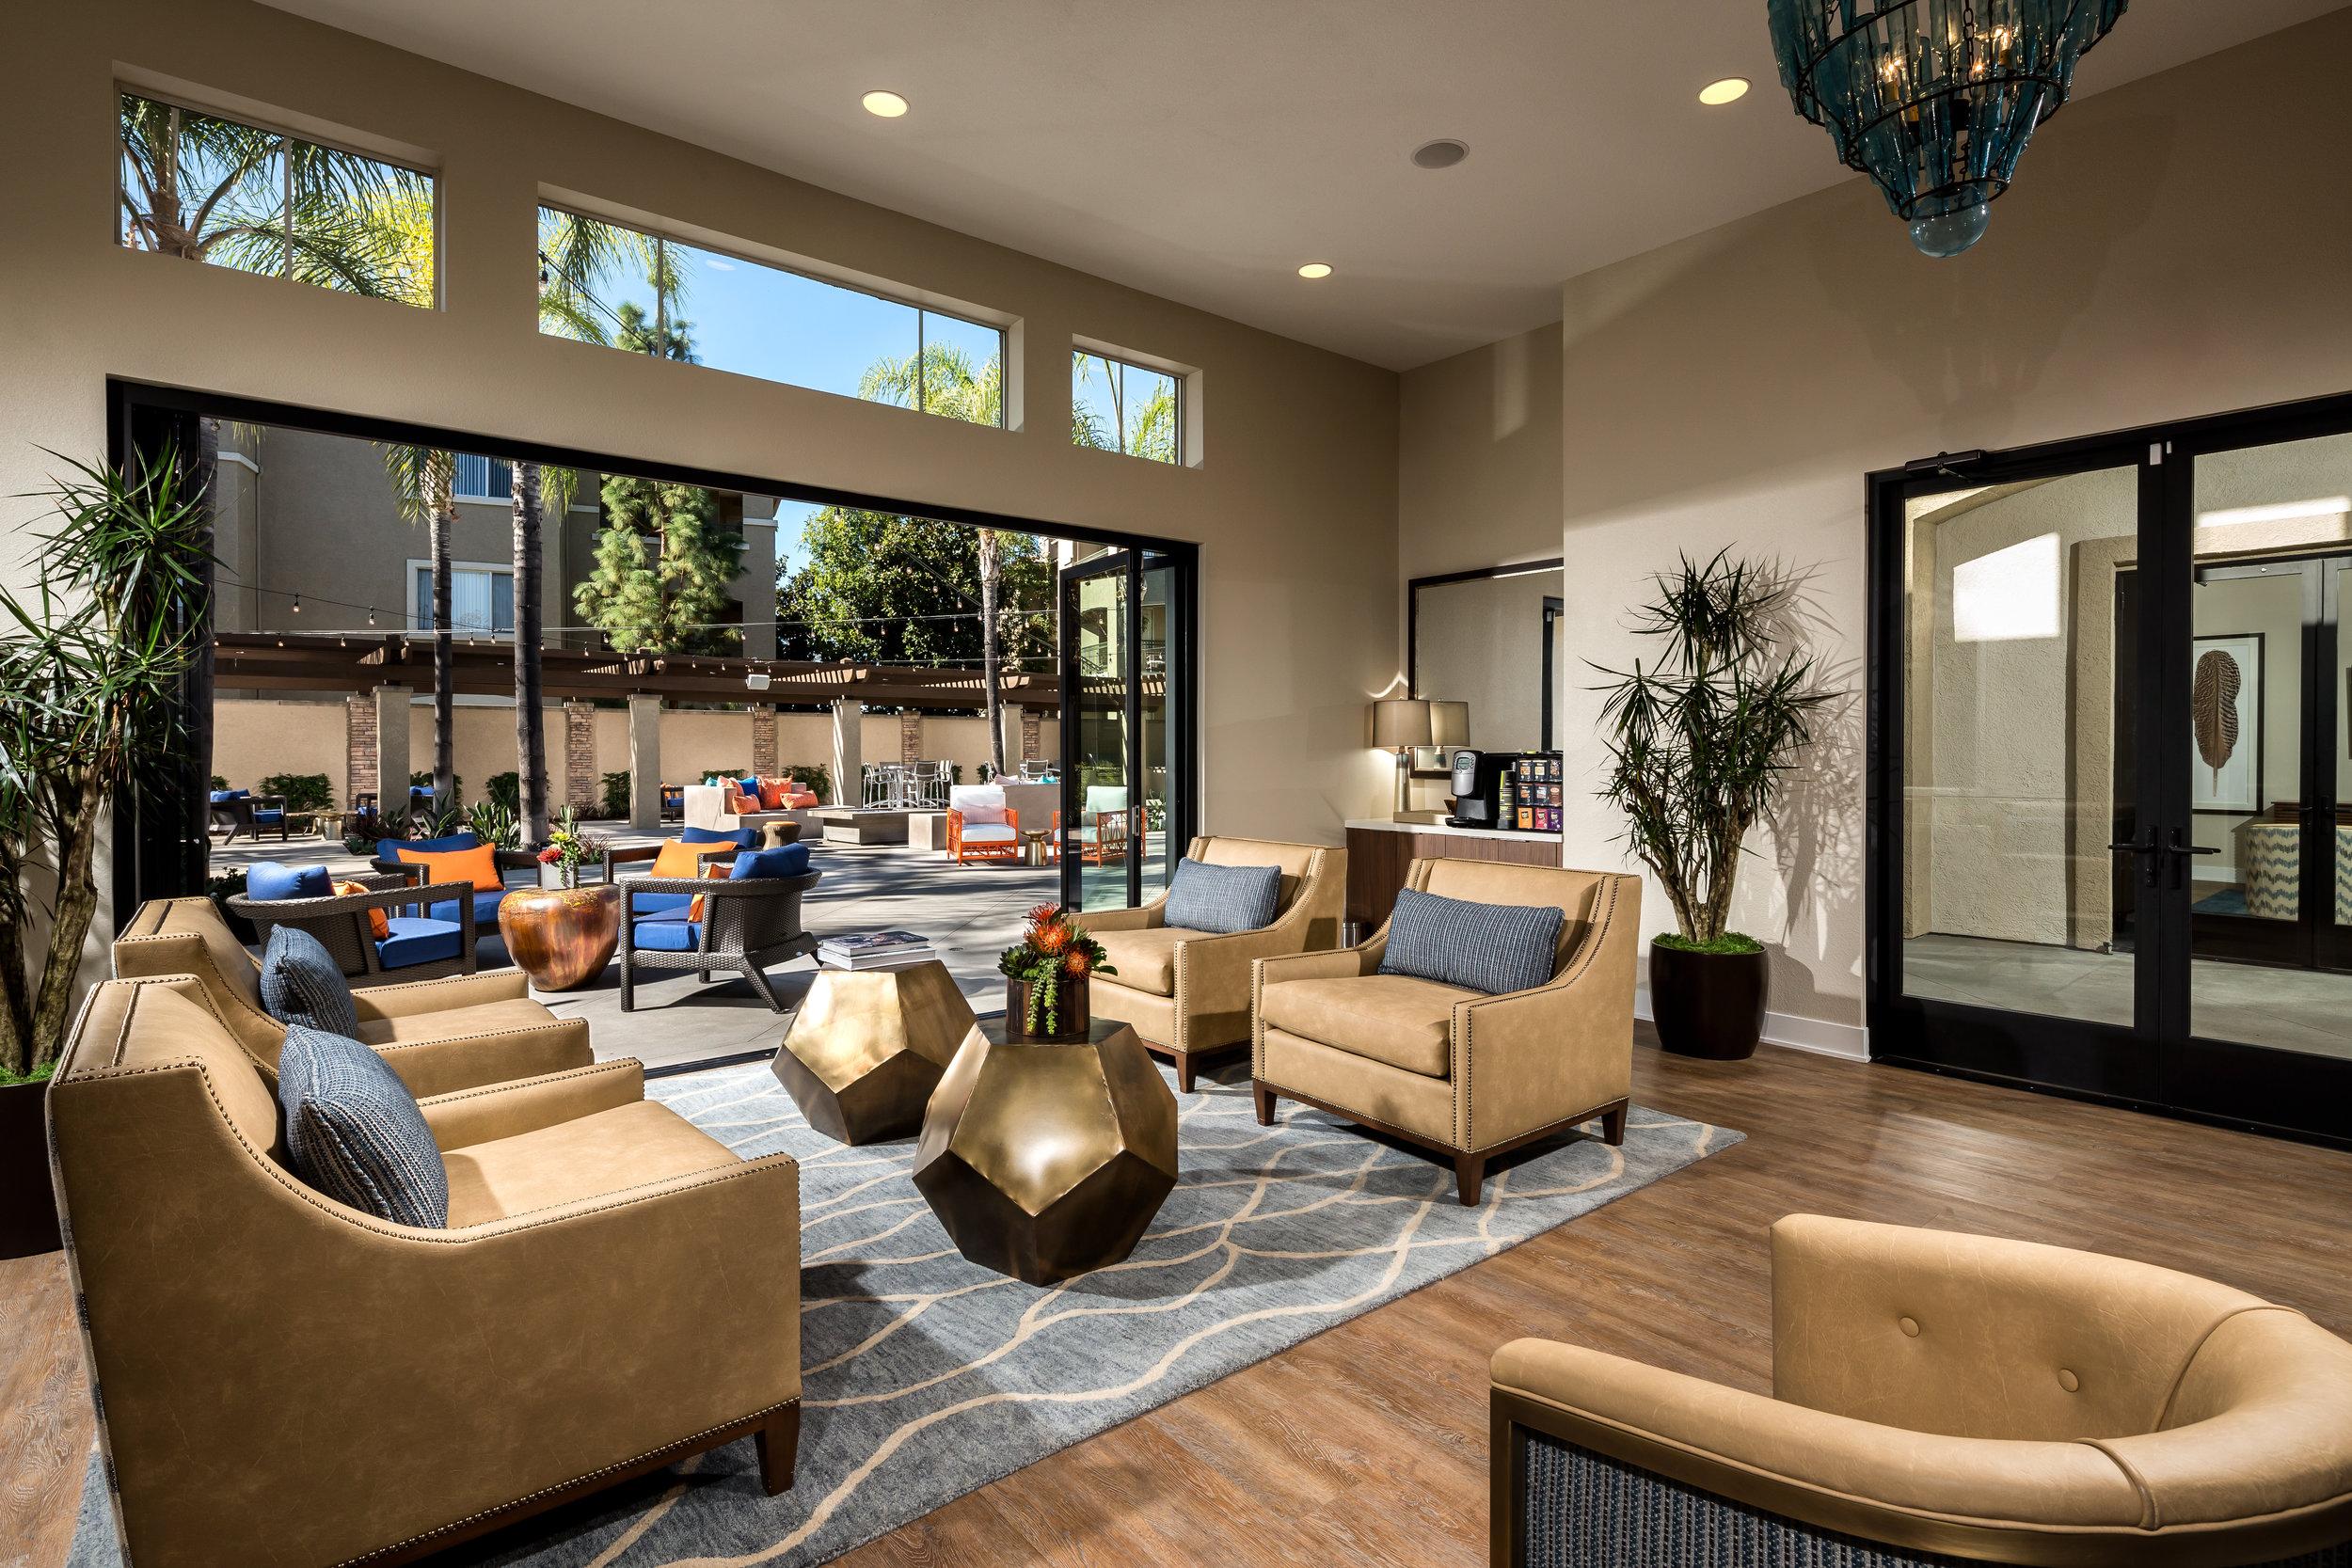 Avila Apartments - Rancho Santa Margarita, CA